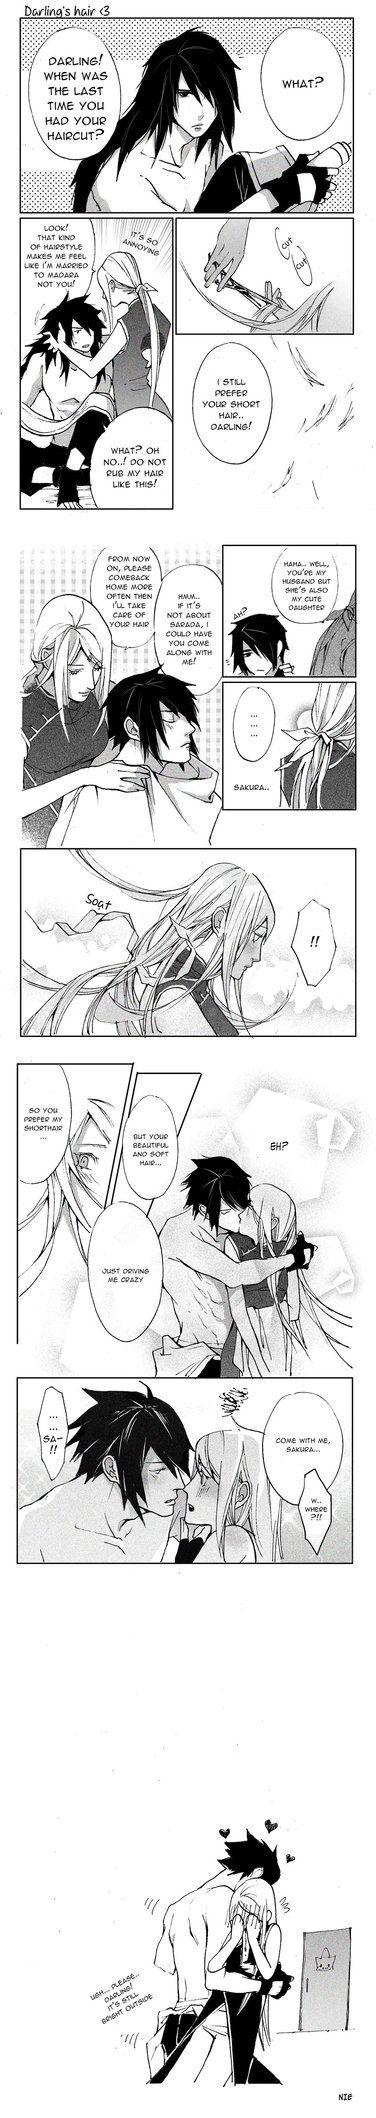 There was a headcanon I stumbled upon on Tumblr and I had to draw it. Poor Sasuke.